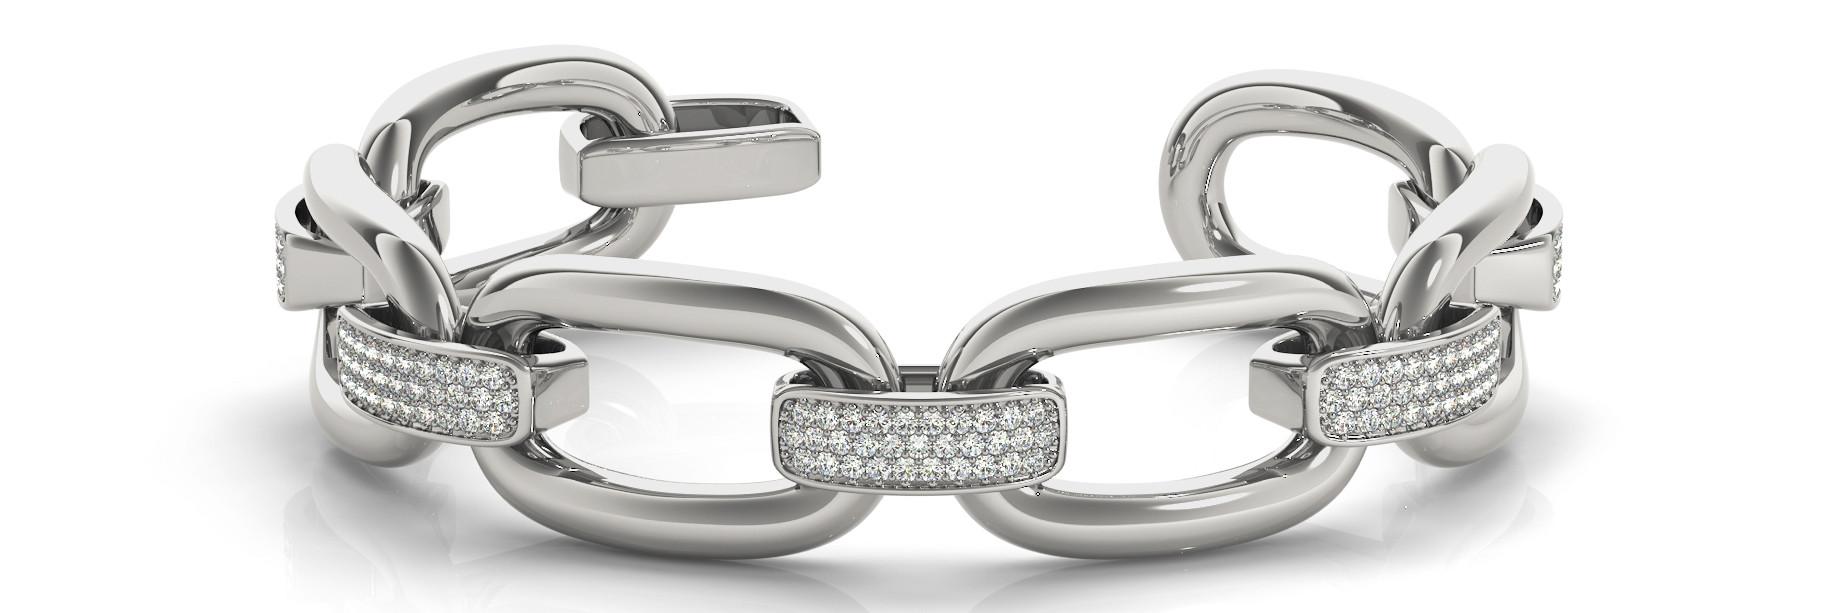 Bracelet Italian Made Length - 8 InchWidth - .70 Inch